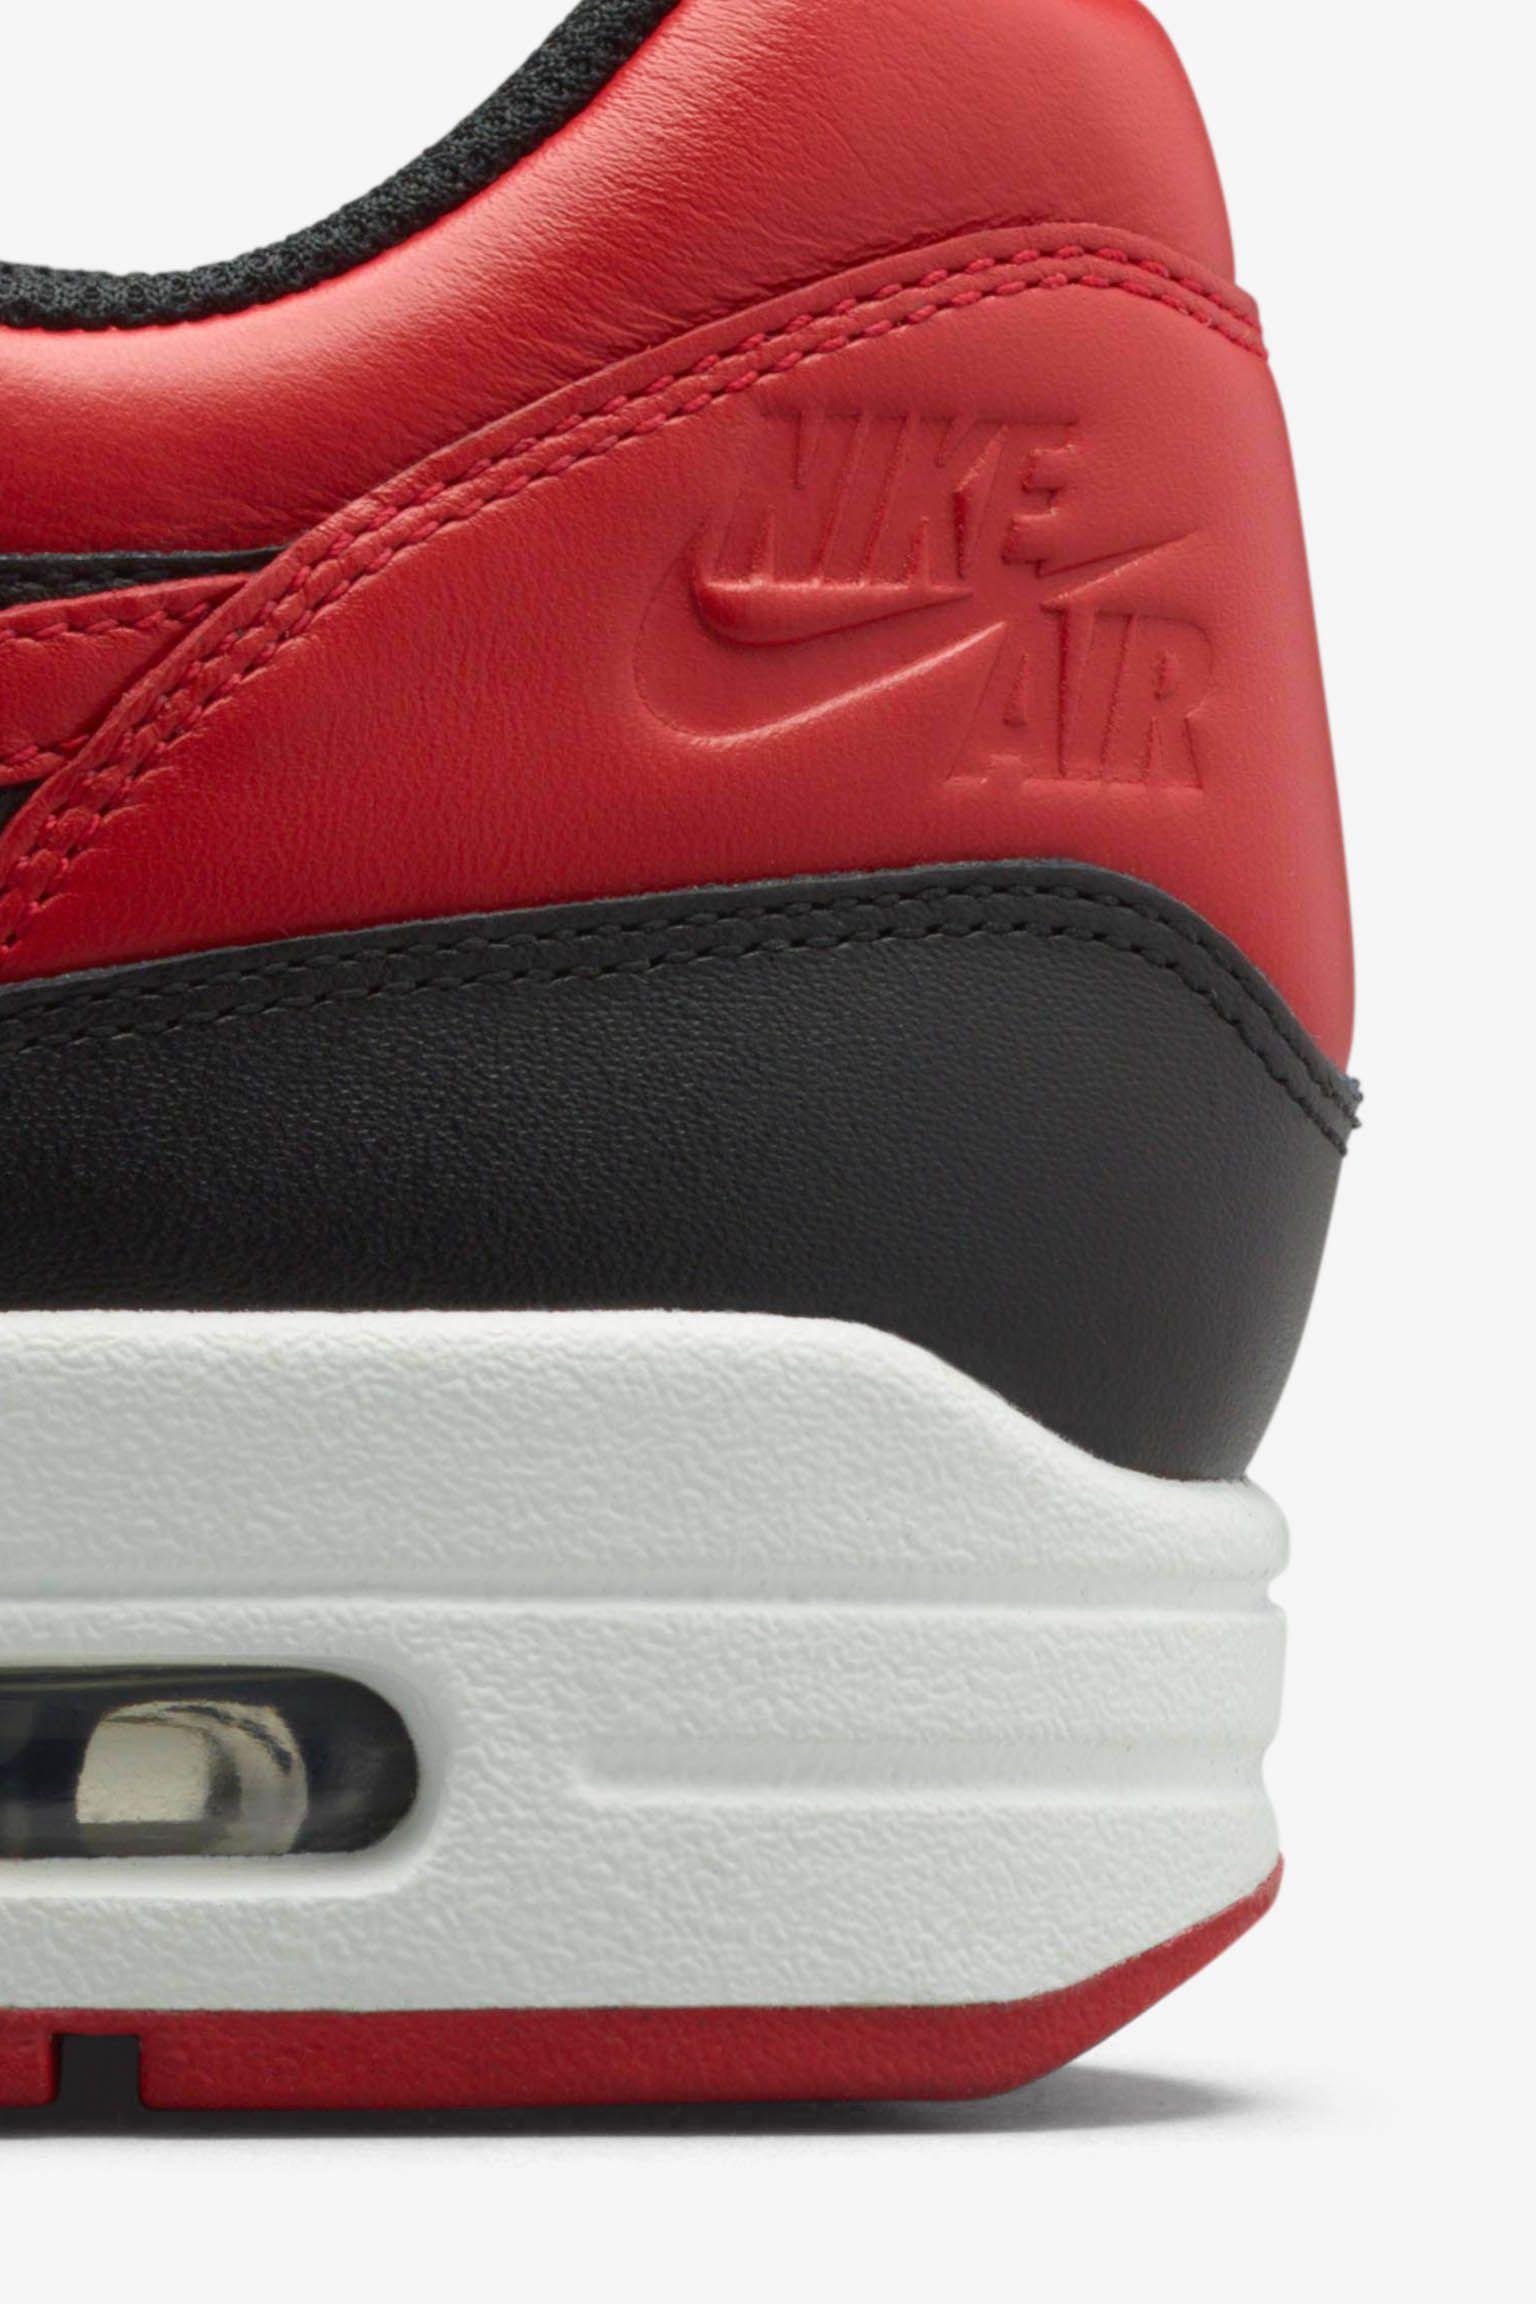 Nike Air Max 1 'Bred'